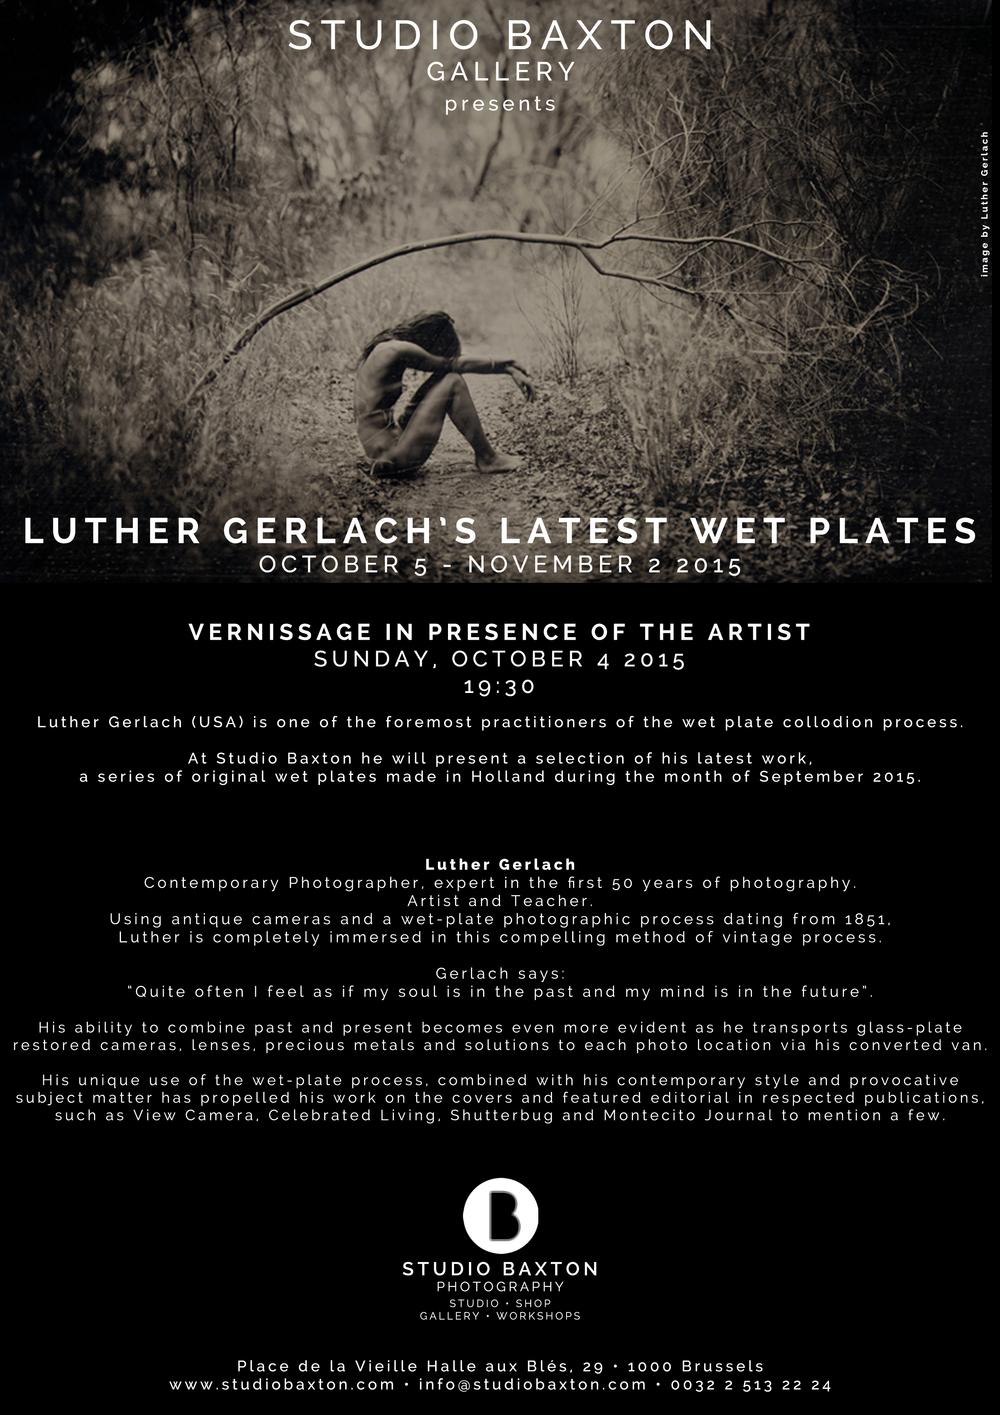 LGerlach_Exhibition copy copy.jpg